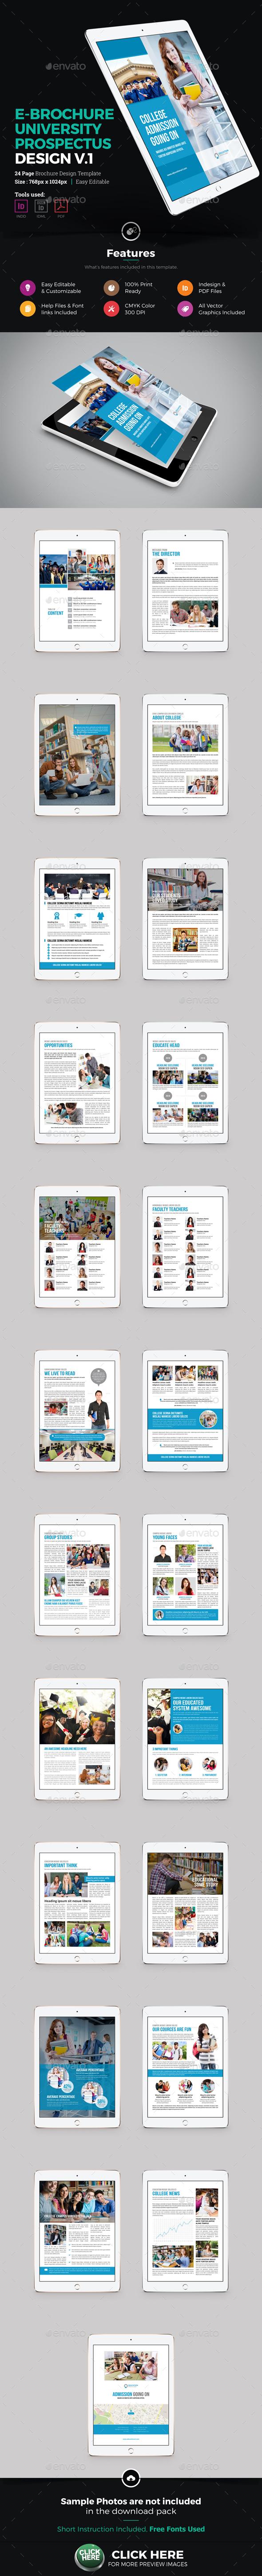 E-Brochure University Prospectus Design v1 - ePublishing